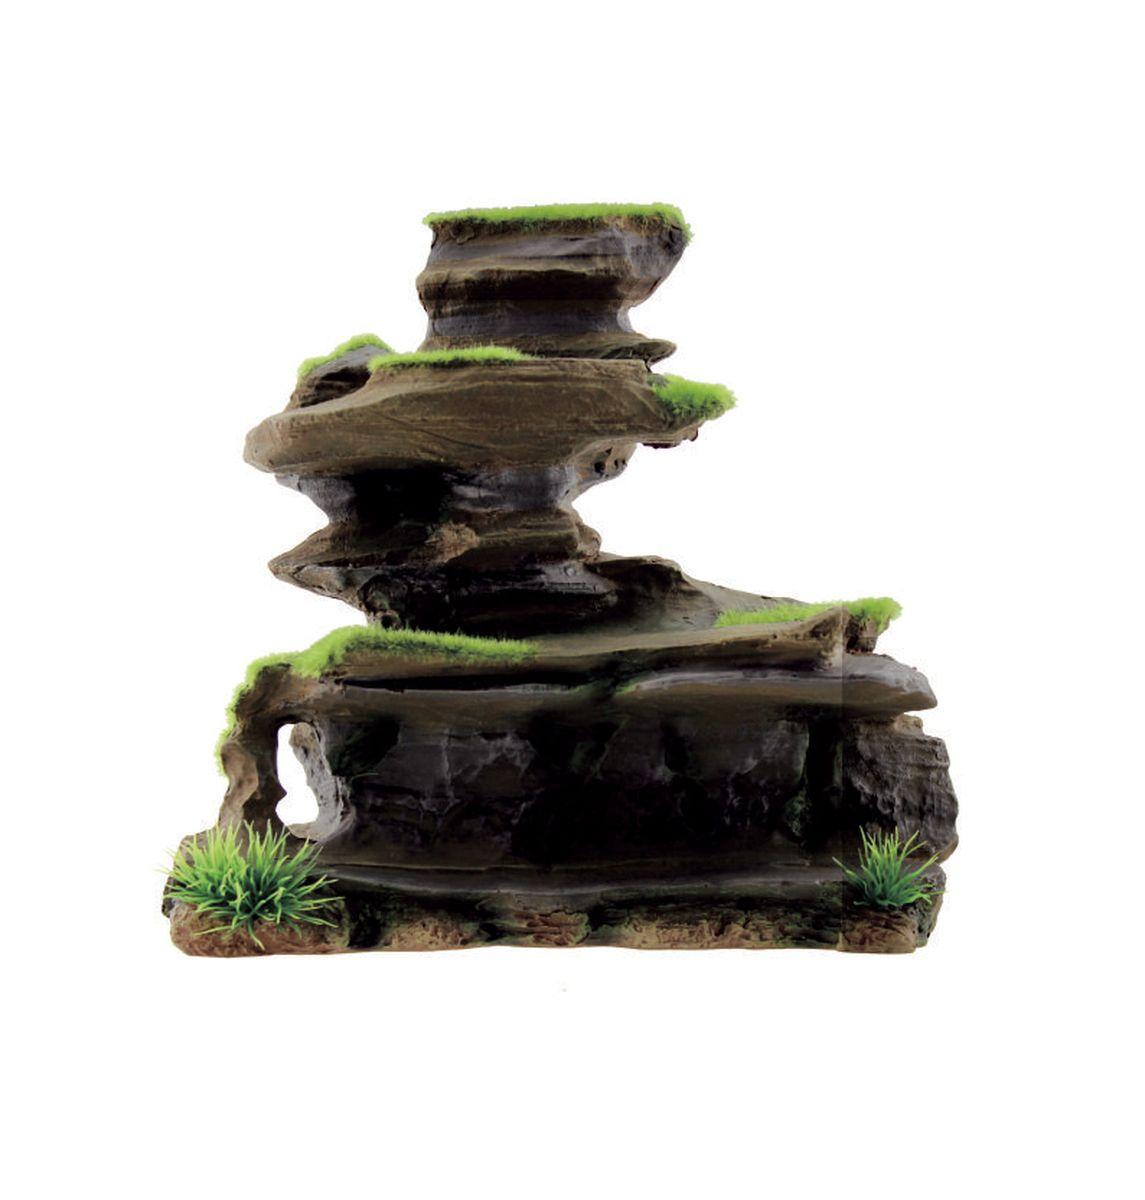 Декорация для аквариума ArtUniq Фигурная скала со мхом, 22,5 x 11,5 x 21,5 см